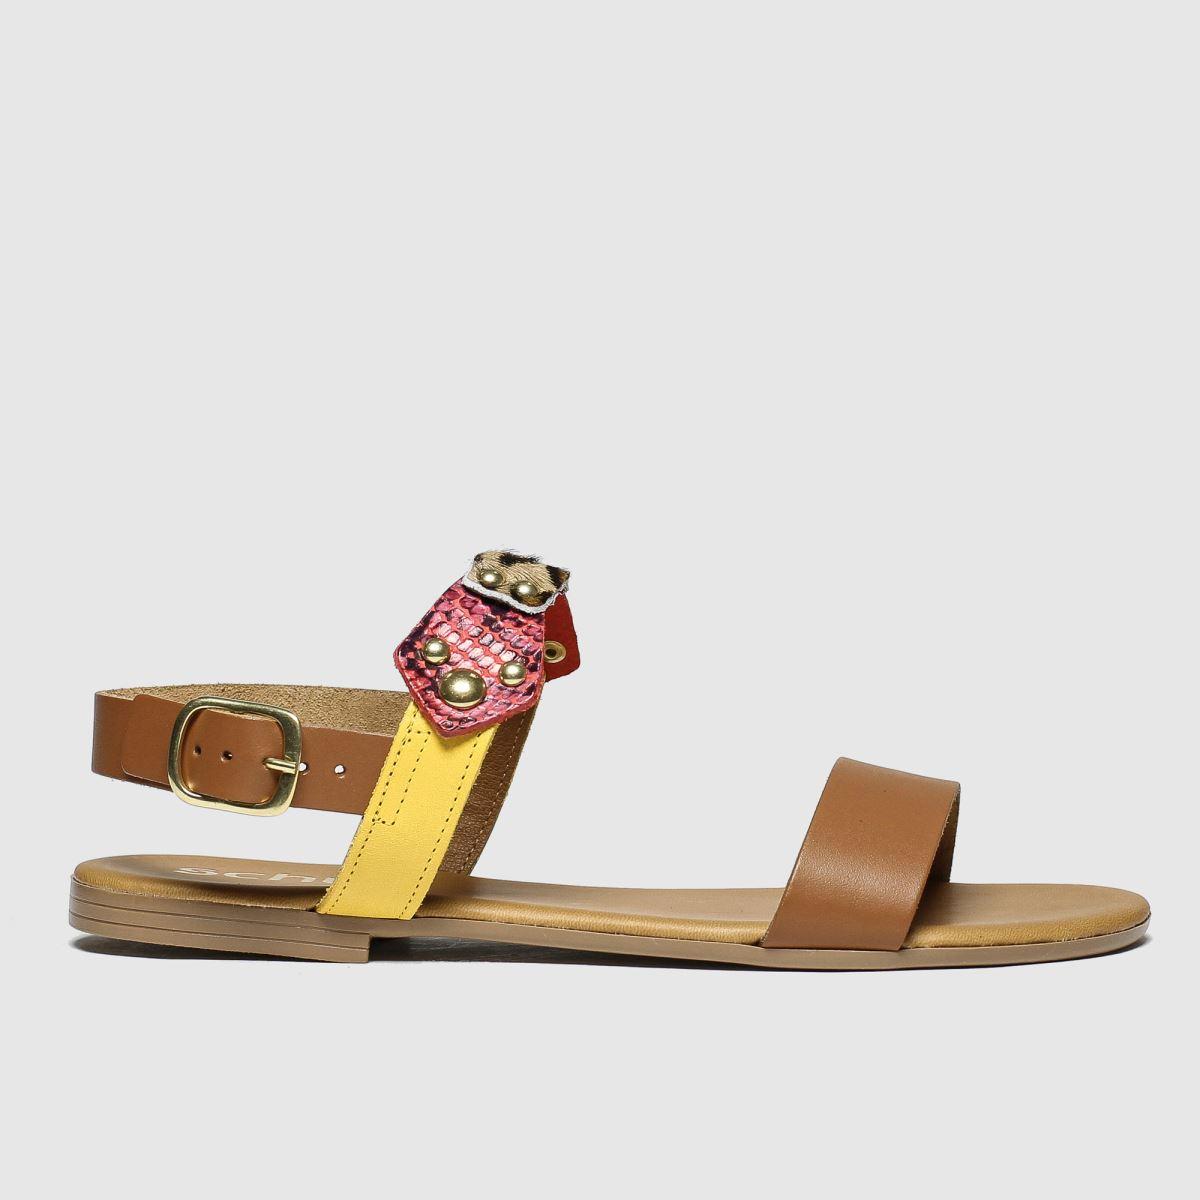 schuh Schuh Tan Scorcher Sandals